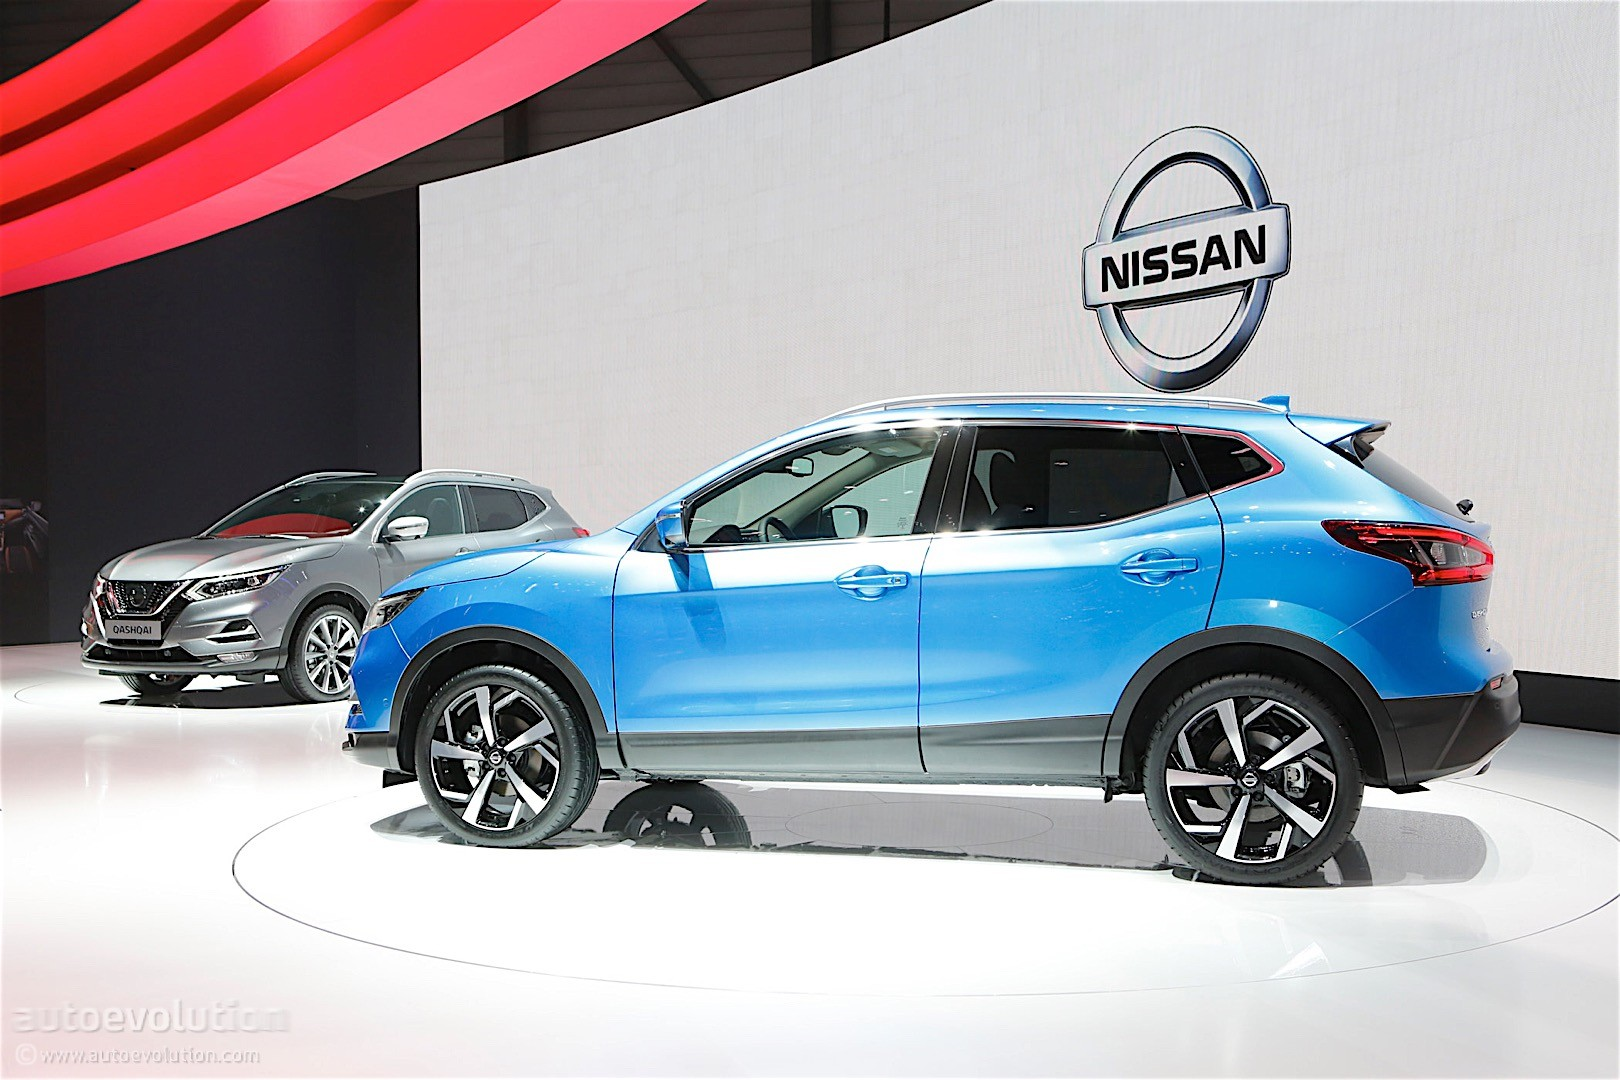 2014 nissan qashqai rendering autoevolution